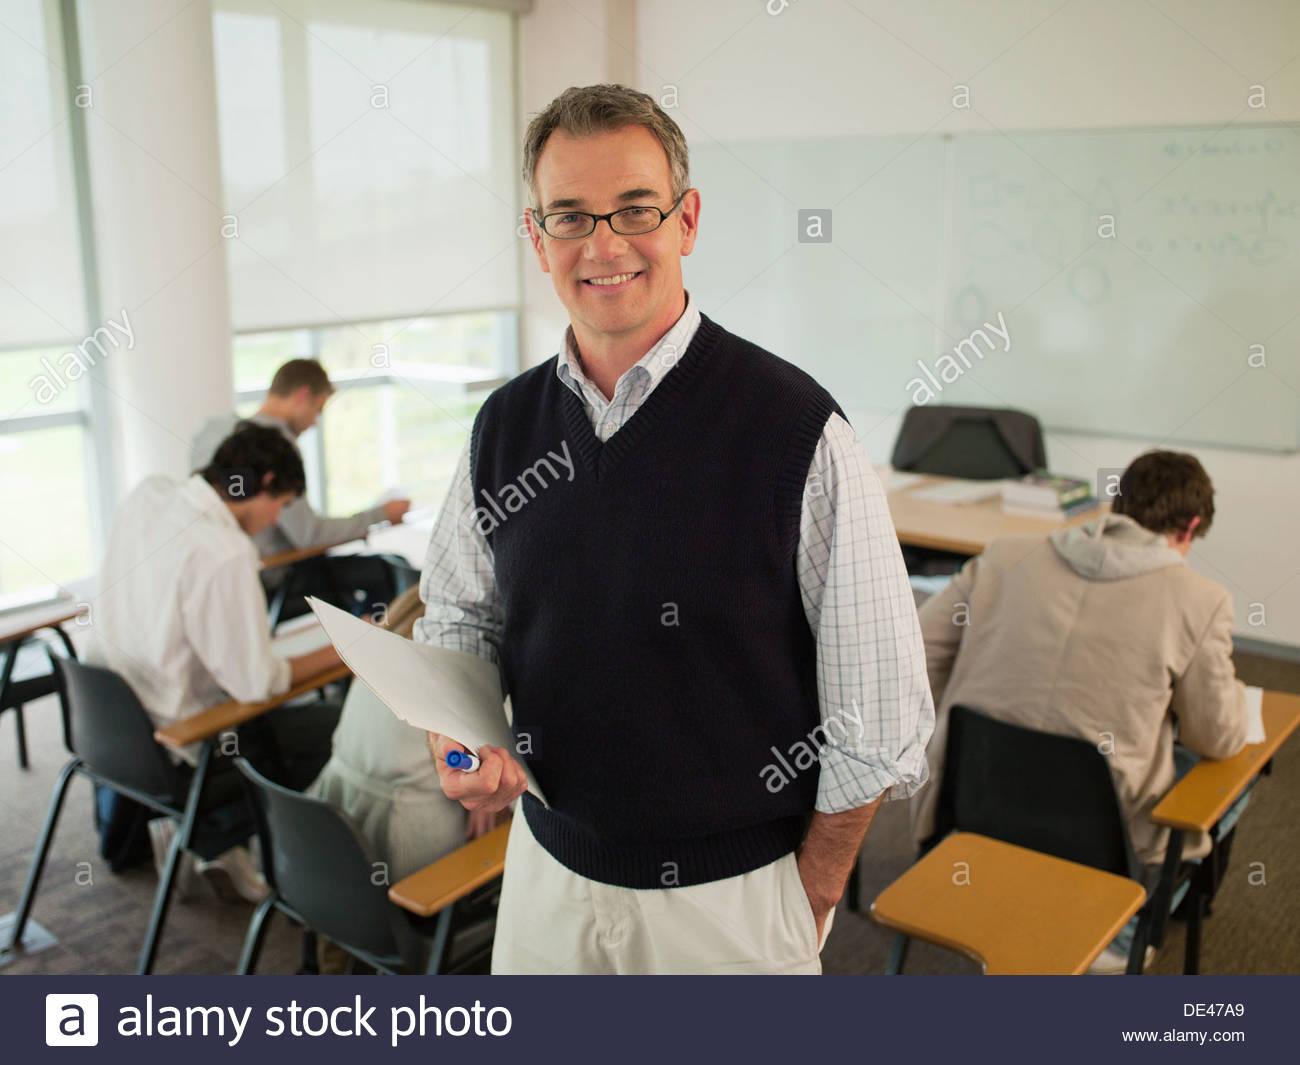 Smiling professor in classroom - Stock Image